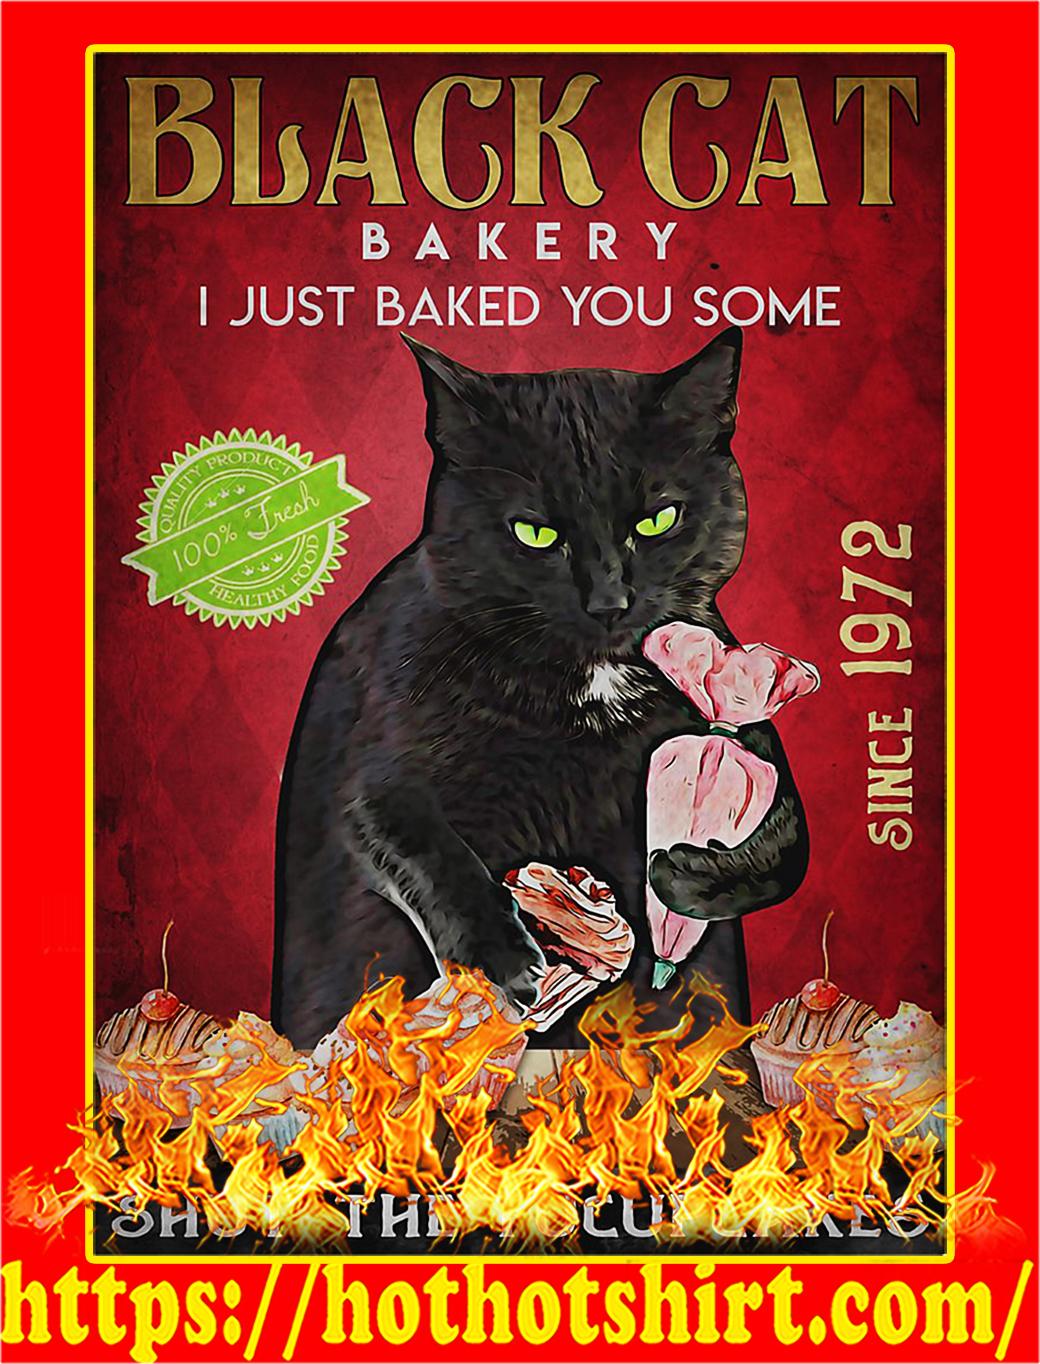 Black cat bakery shut the fucupcakes poster - A2